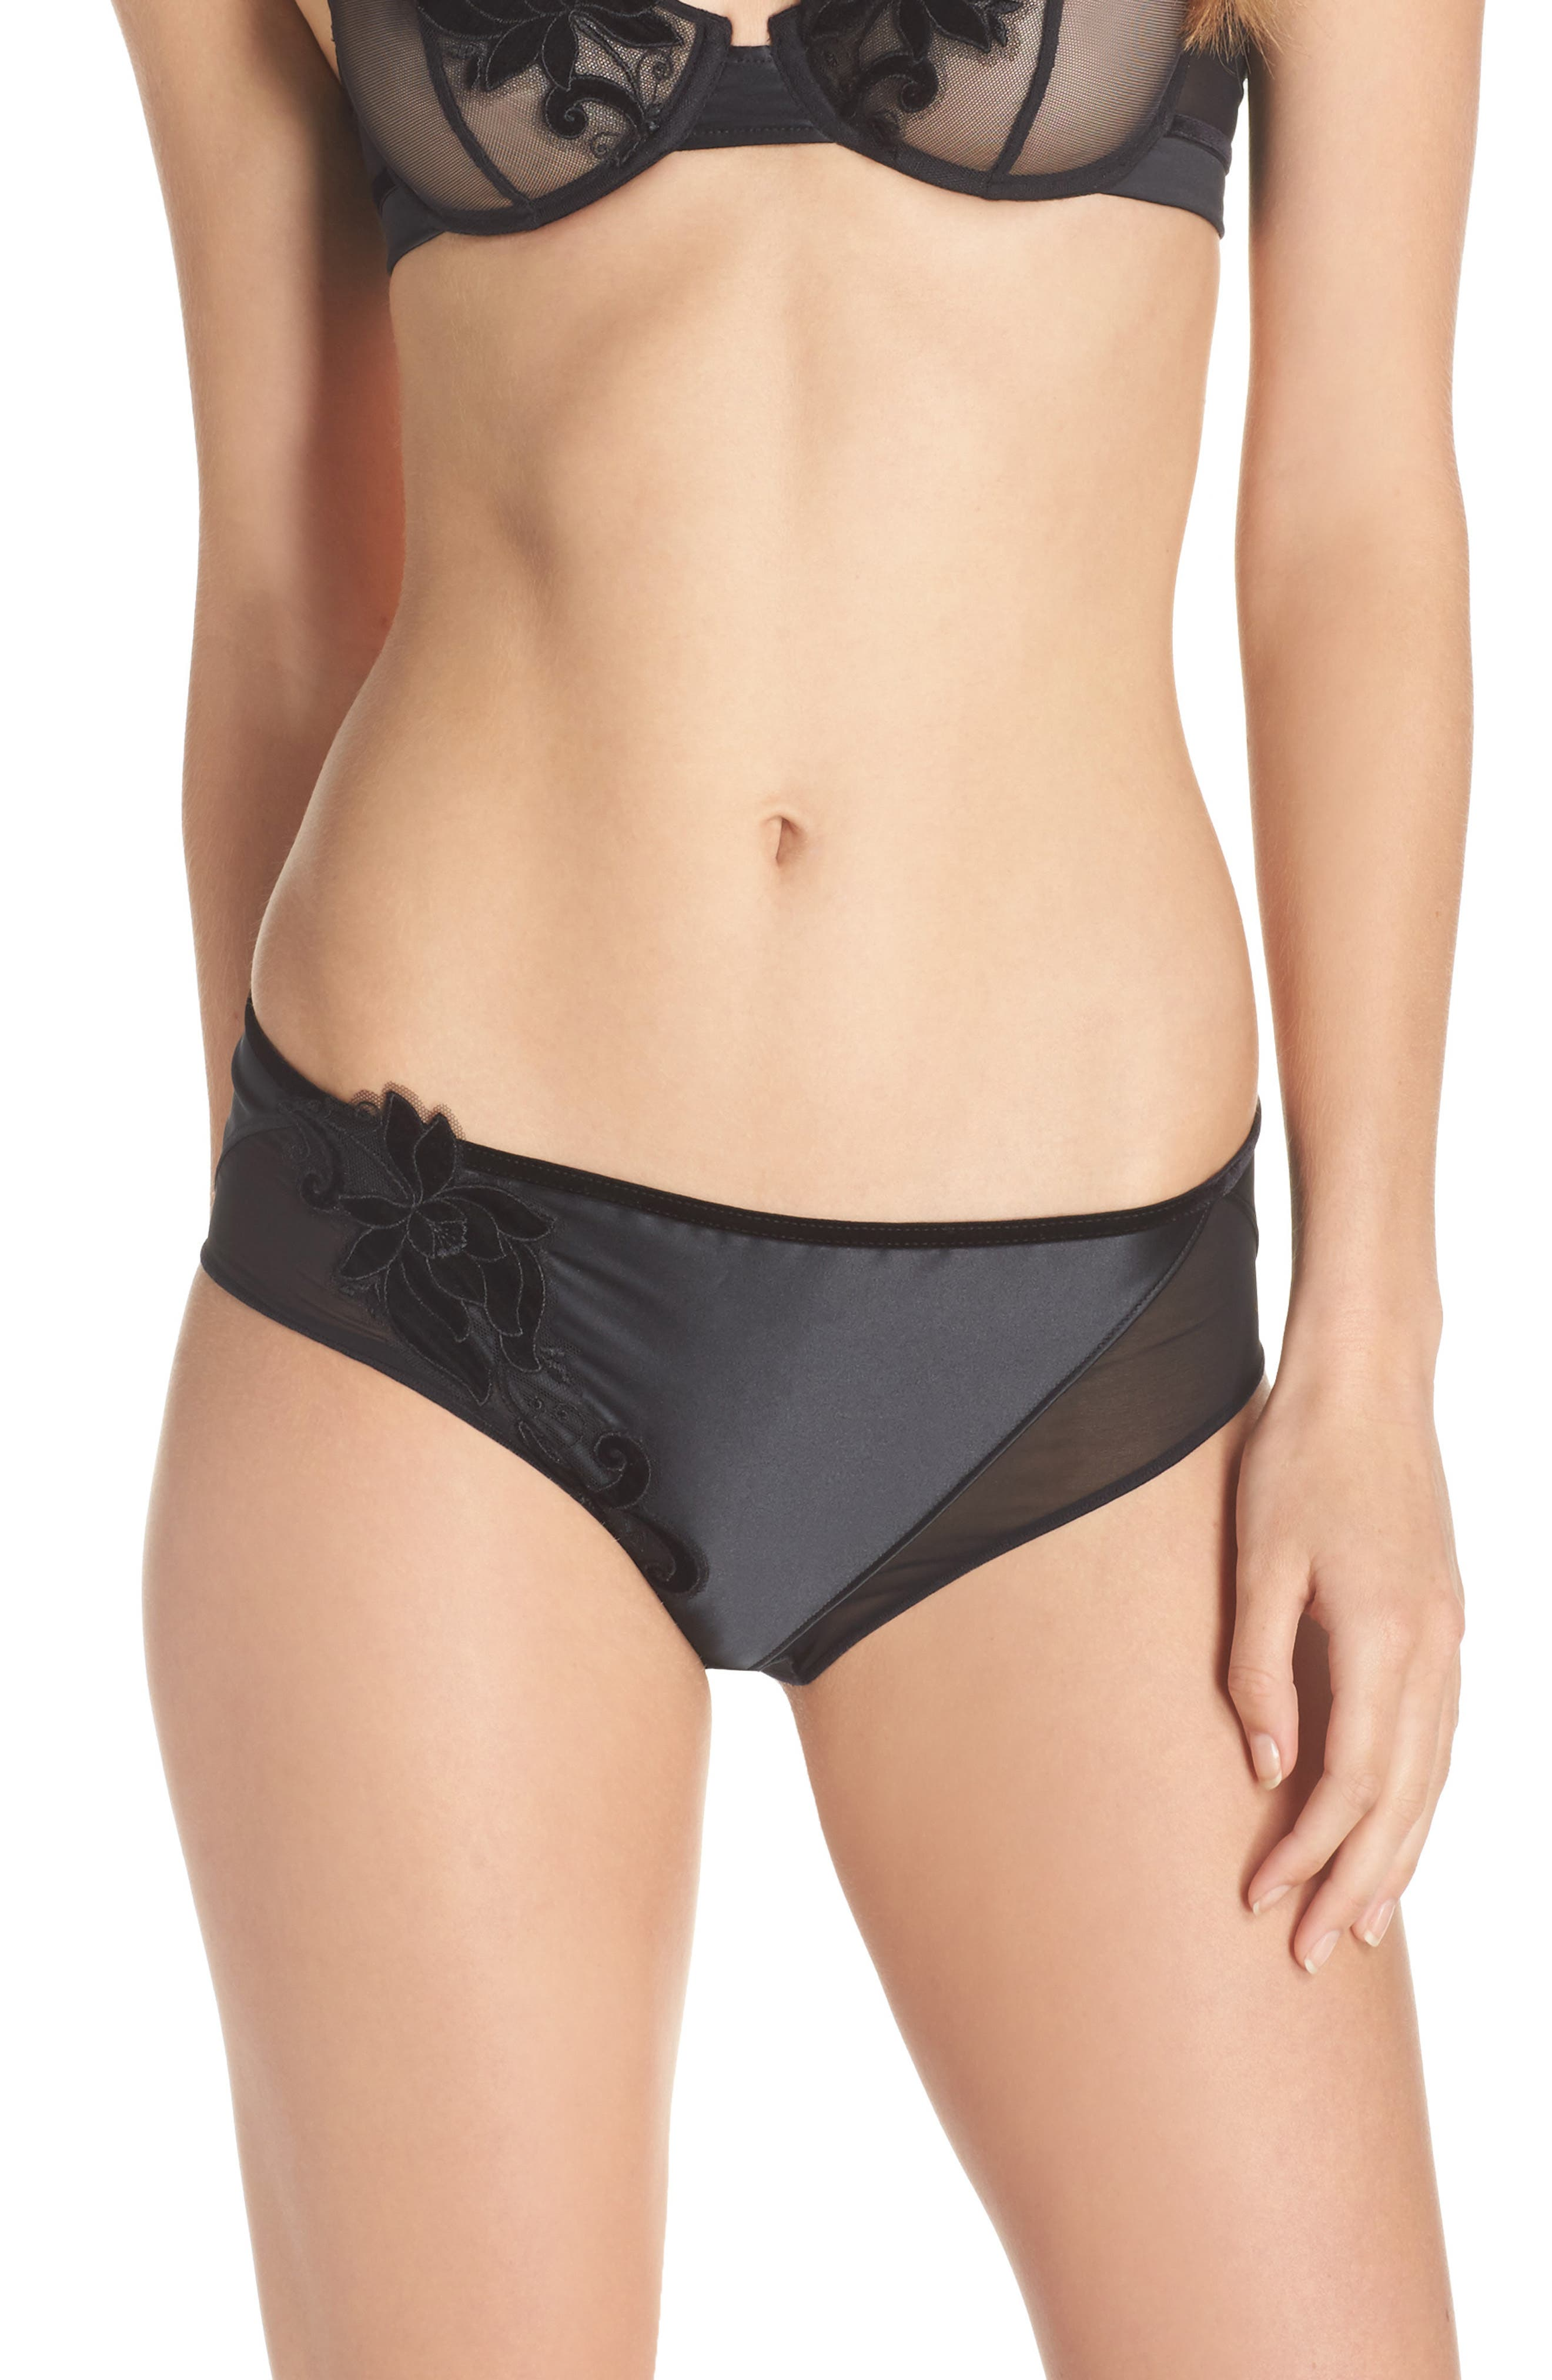 Simone Perele Haute Couture Bikini